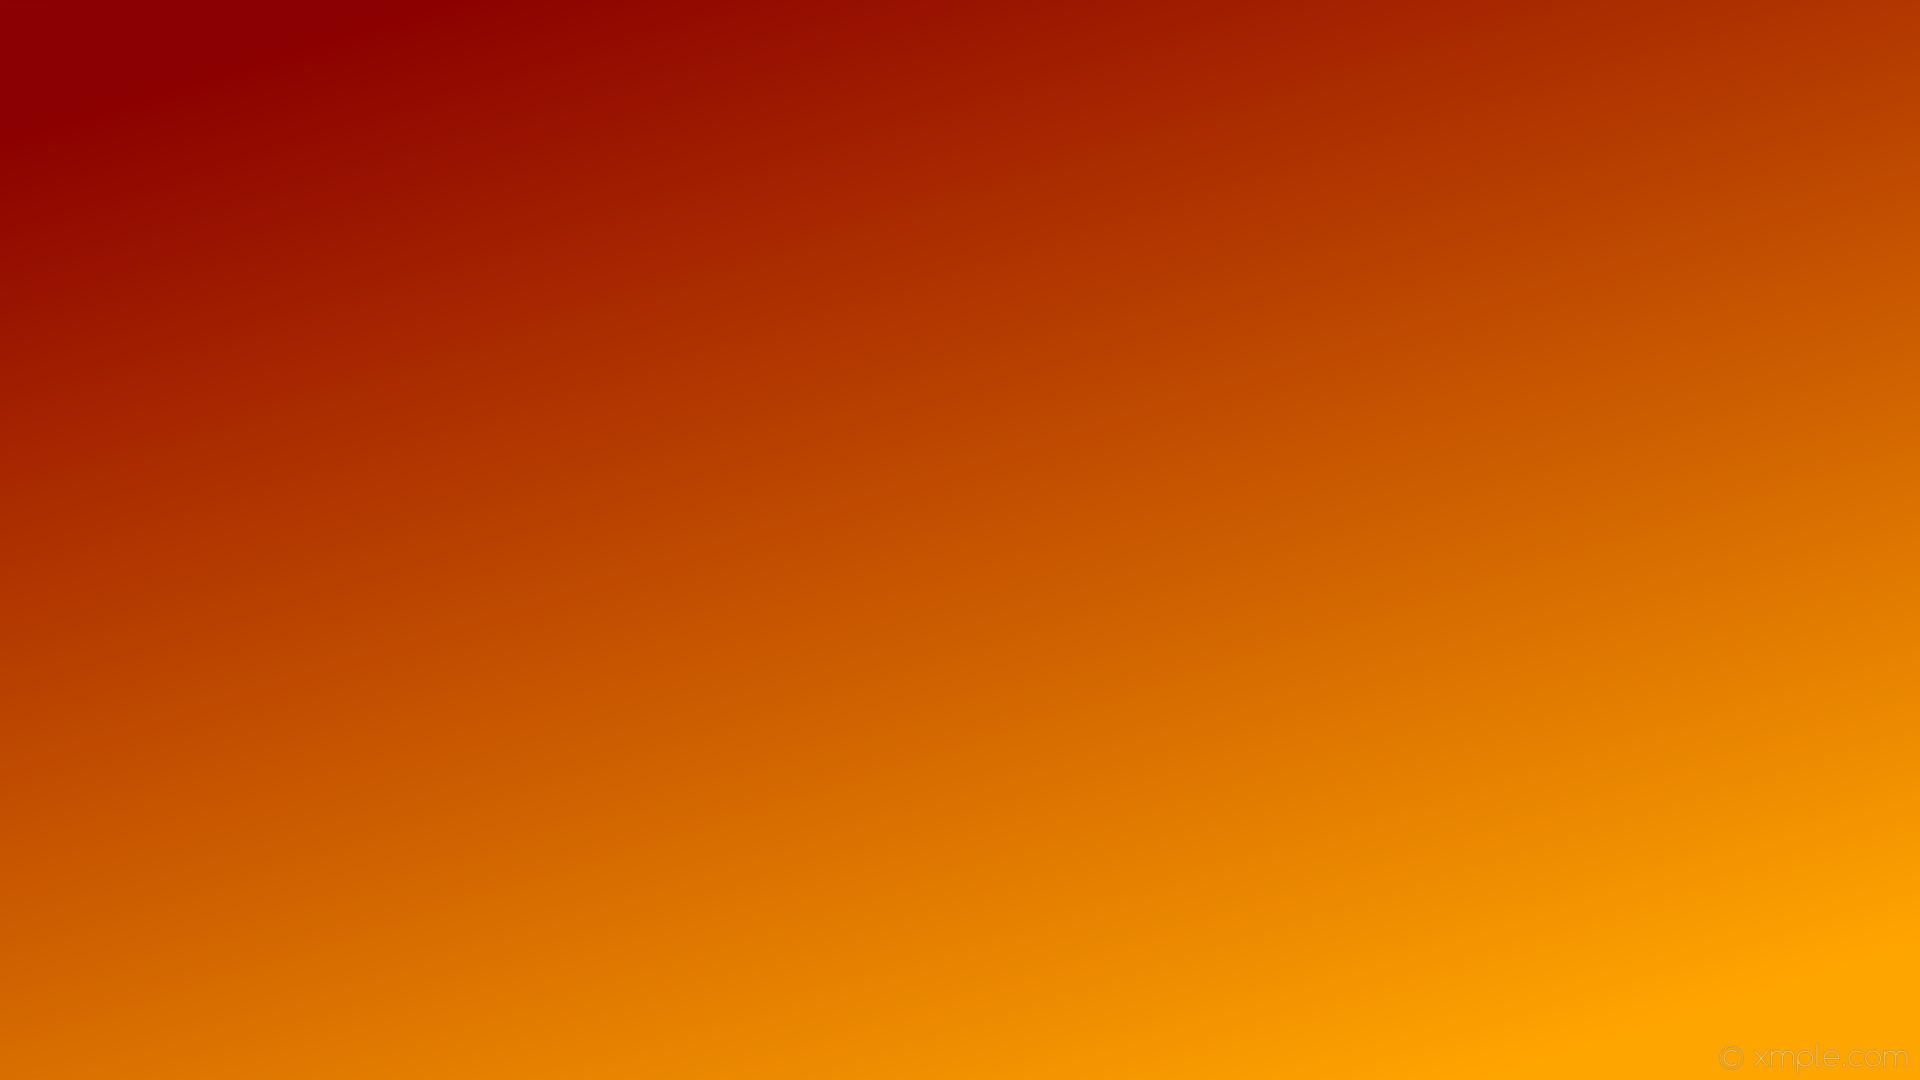 wallpaper gradient red linear orange dark red #ffa500 #8b0000 315°